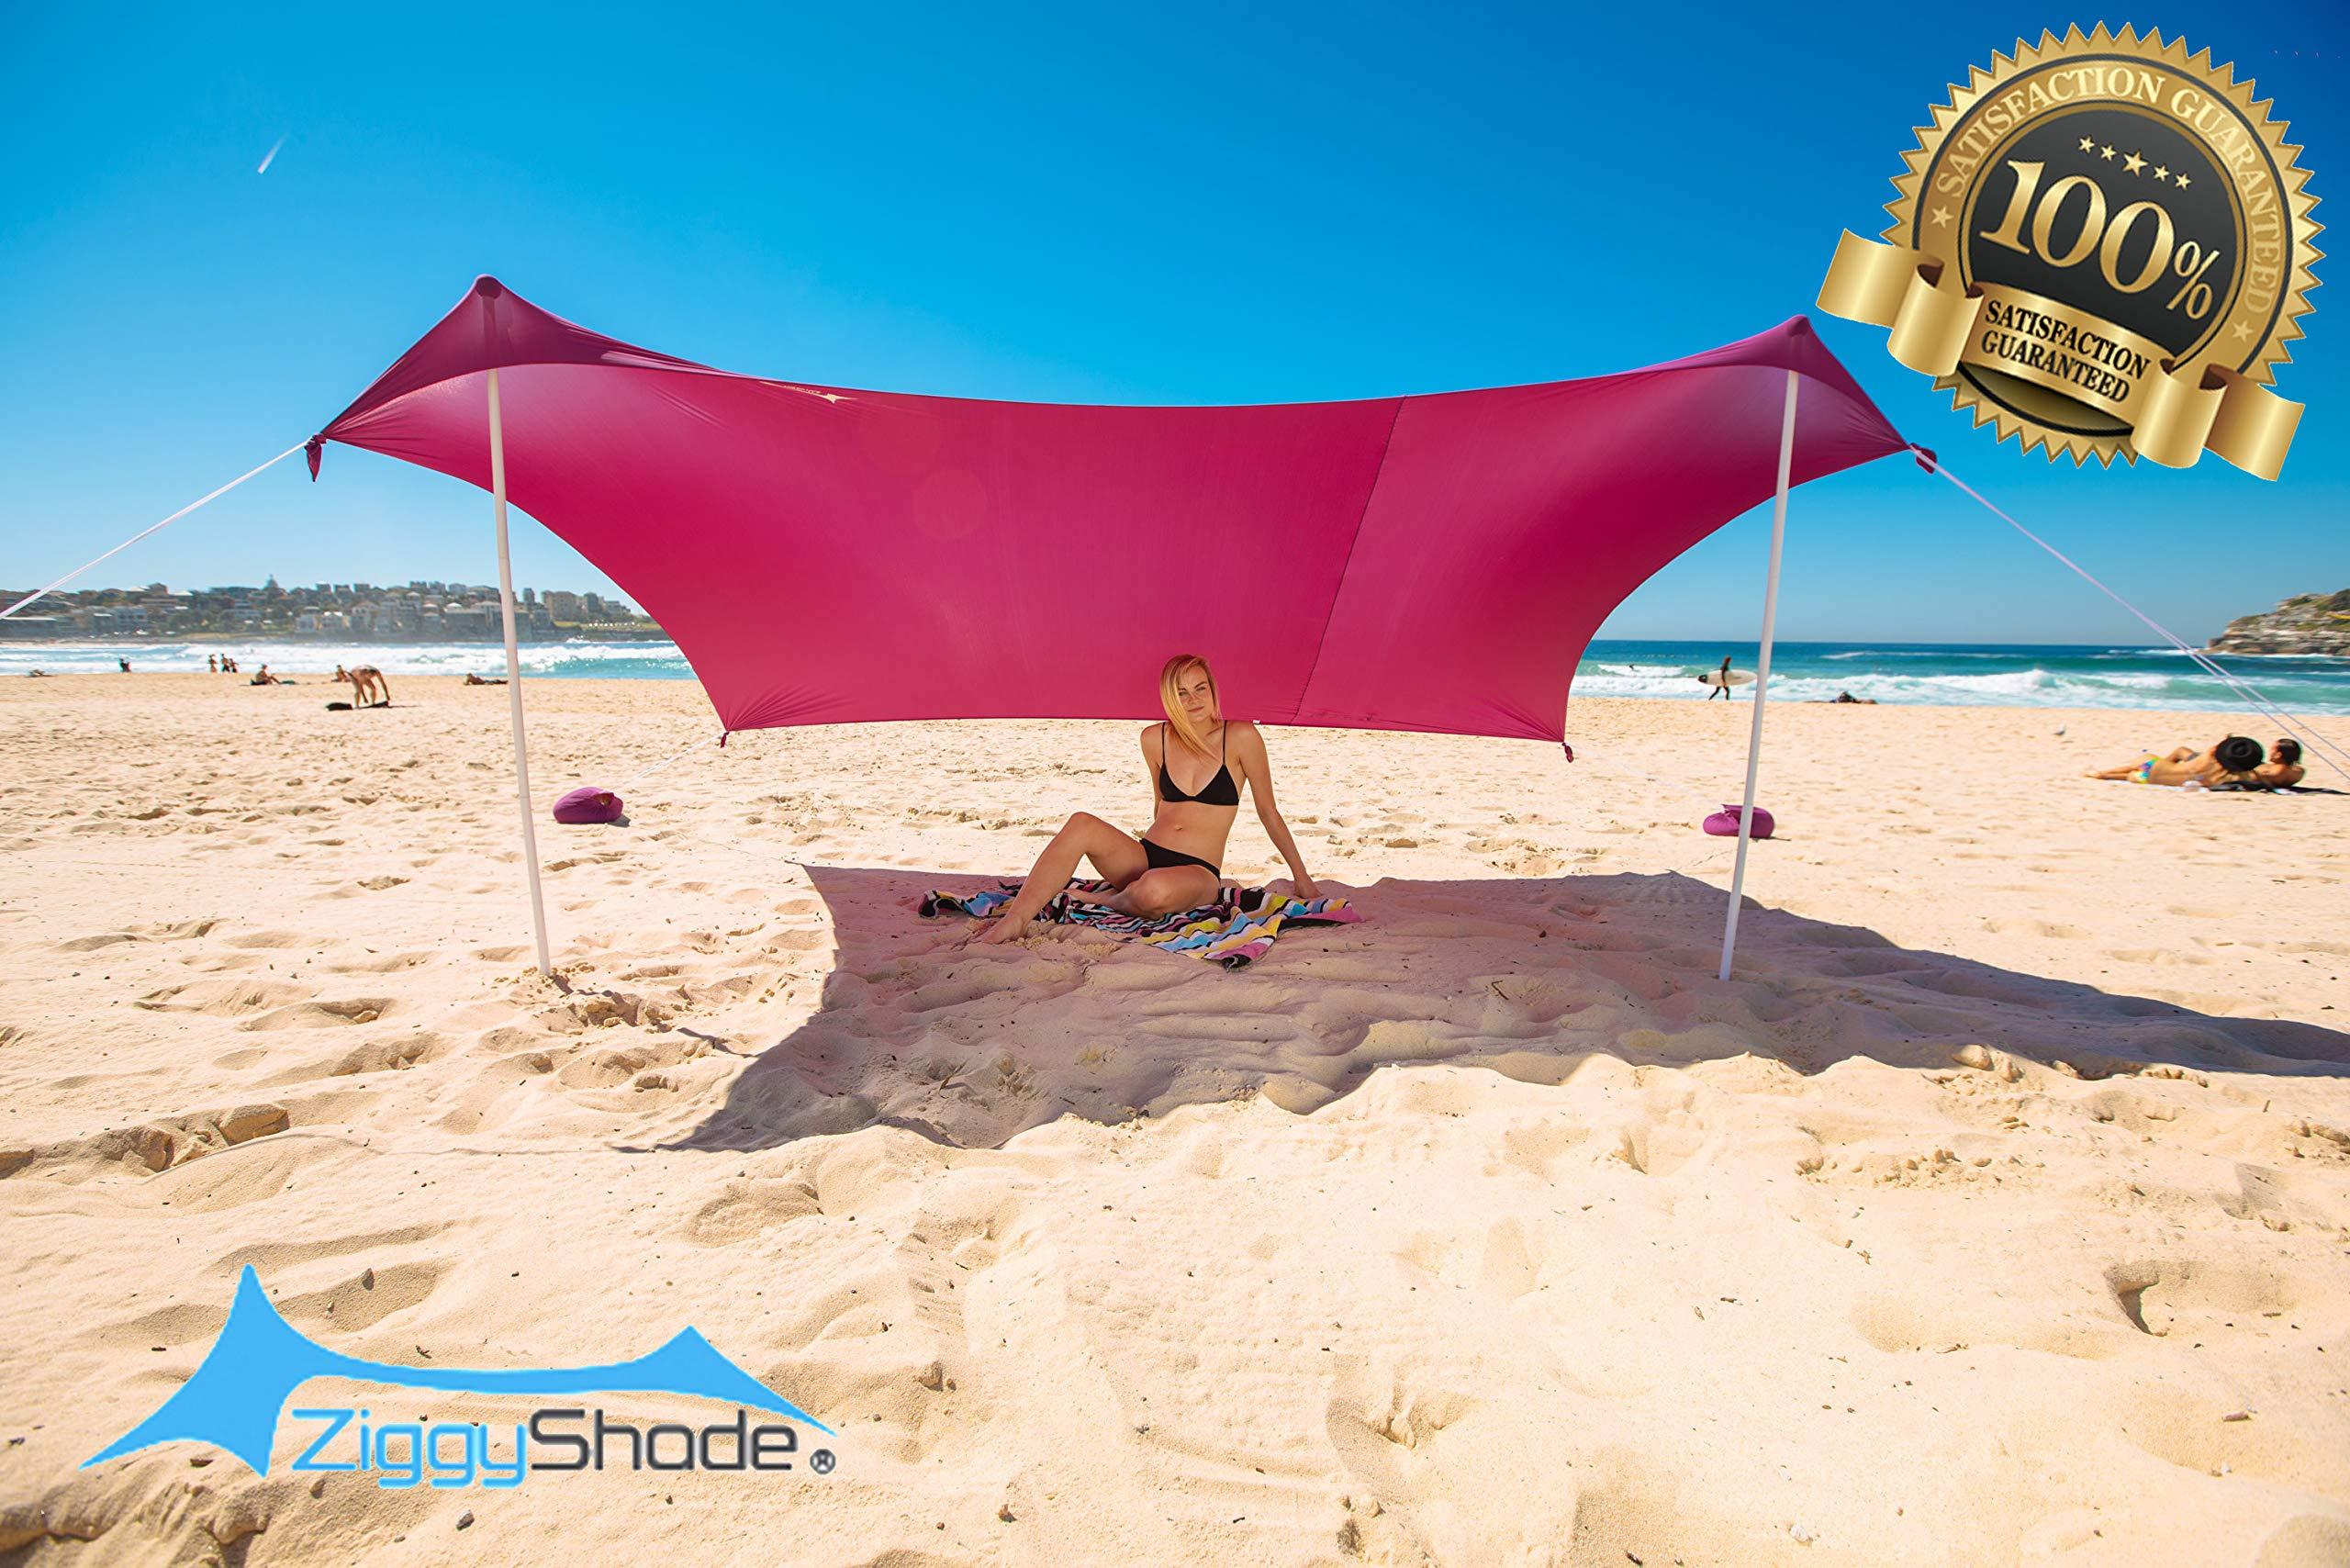 ZiggyShade Family Beach Sunshade - Lightweight Sun Shade Tent with Sandbag Anchors & 4 Free Pegs | UPF50+ UV Quality Lycra Fabric | Large & Portable | Canopy for Parks & Outdoor by ZiggyShade